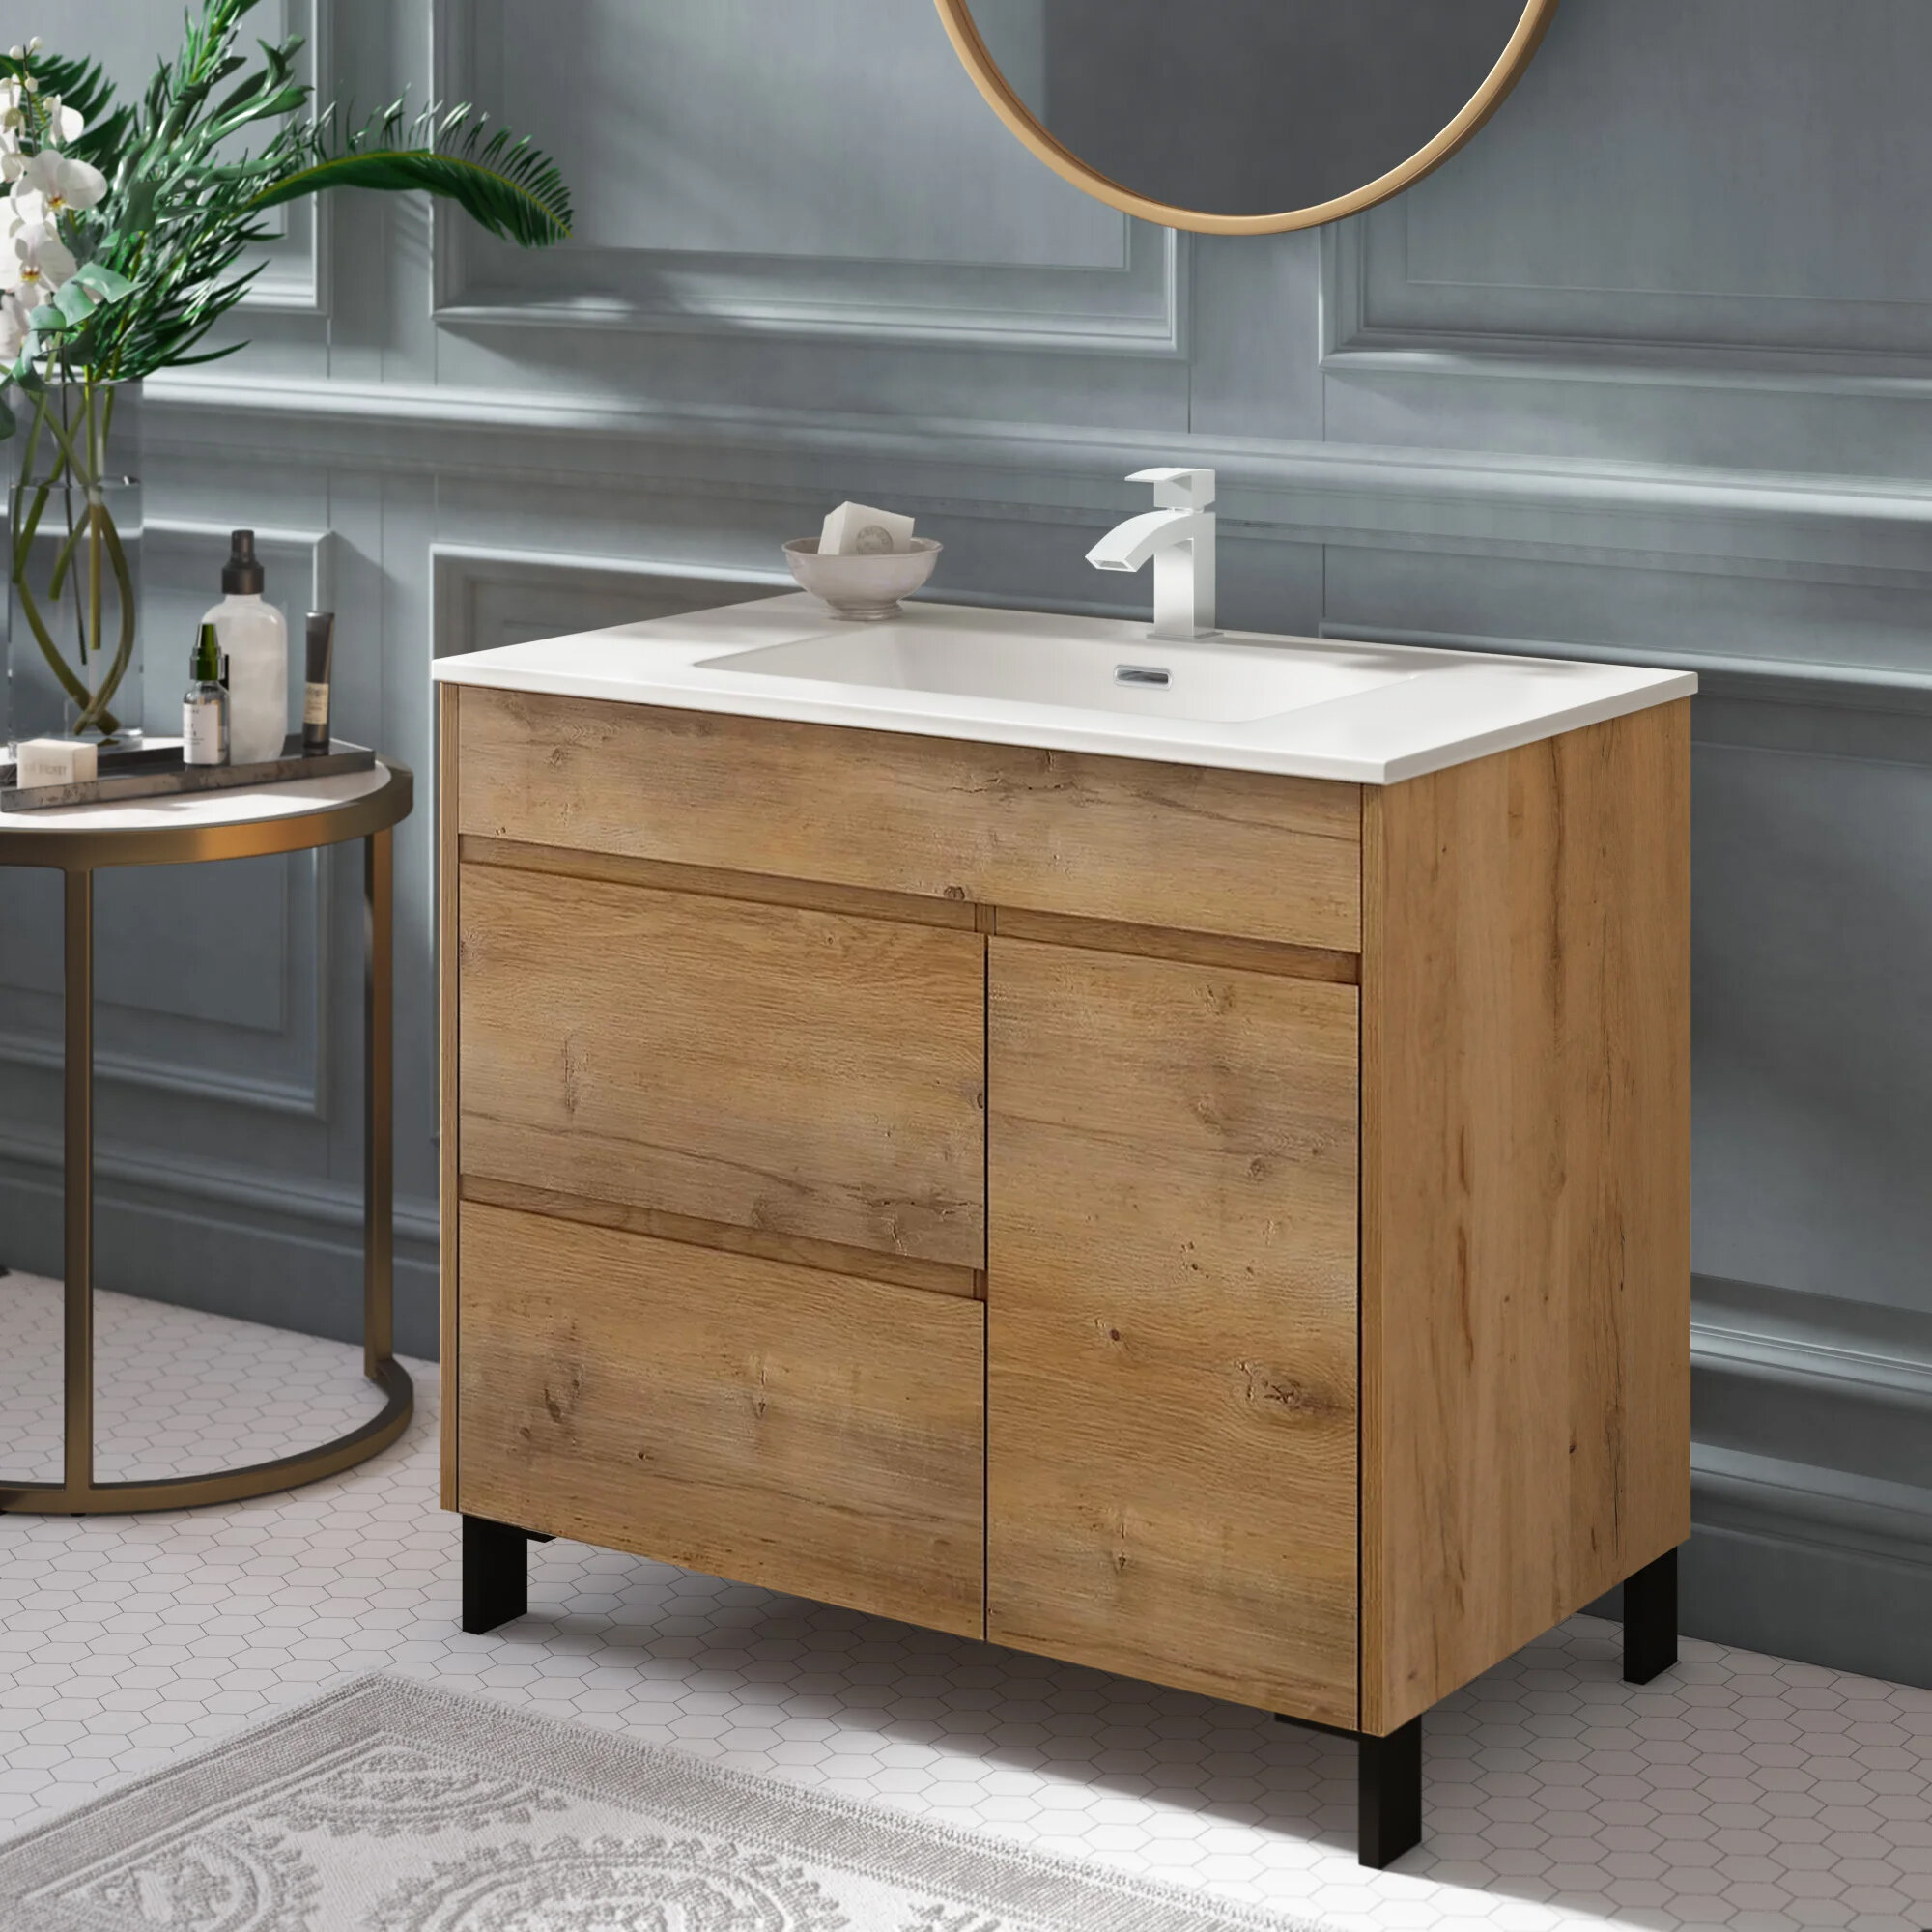 Union Rustic Chumasero 32 Single Bathroom Vanity Set Reviews Wayfair